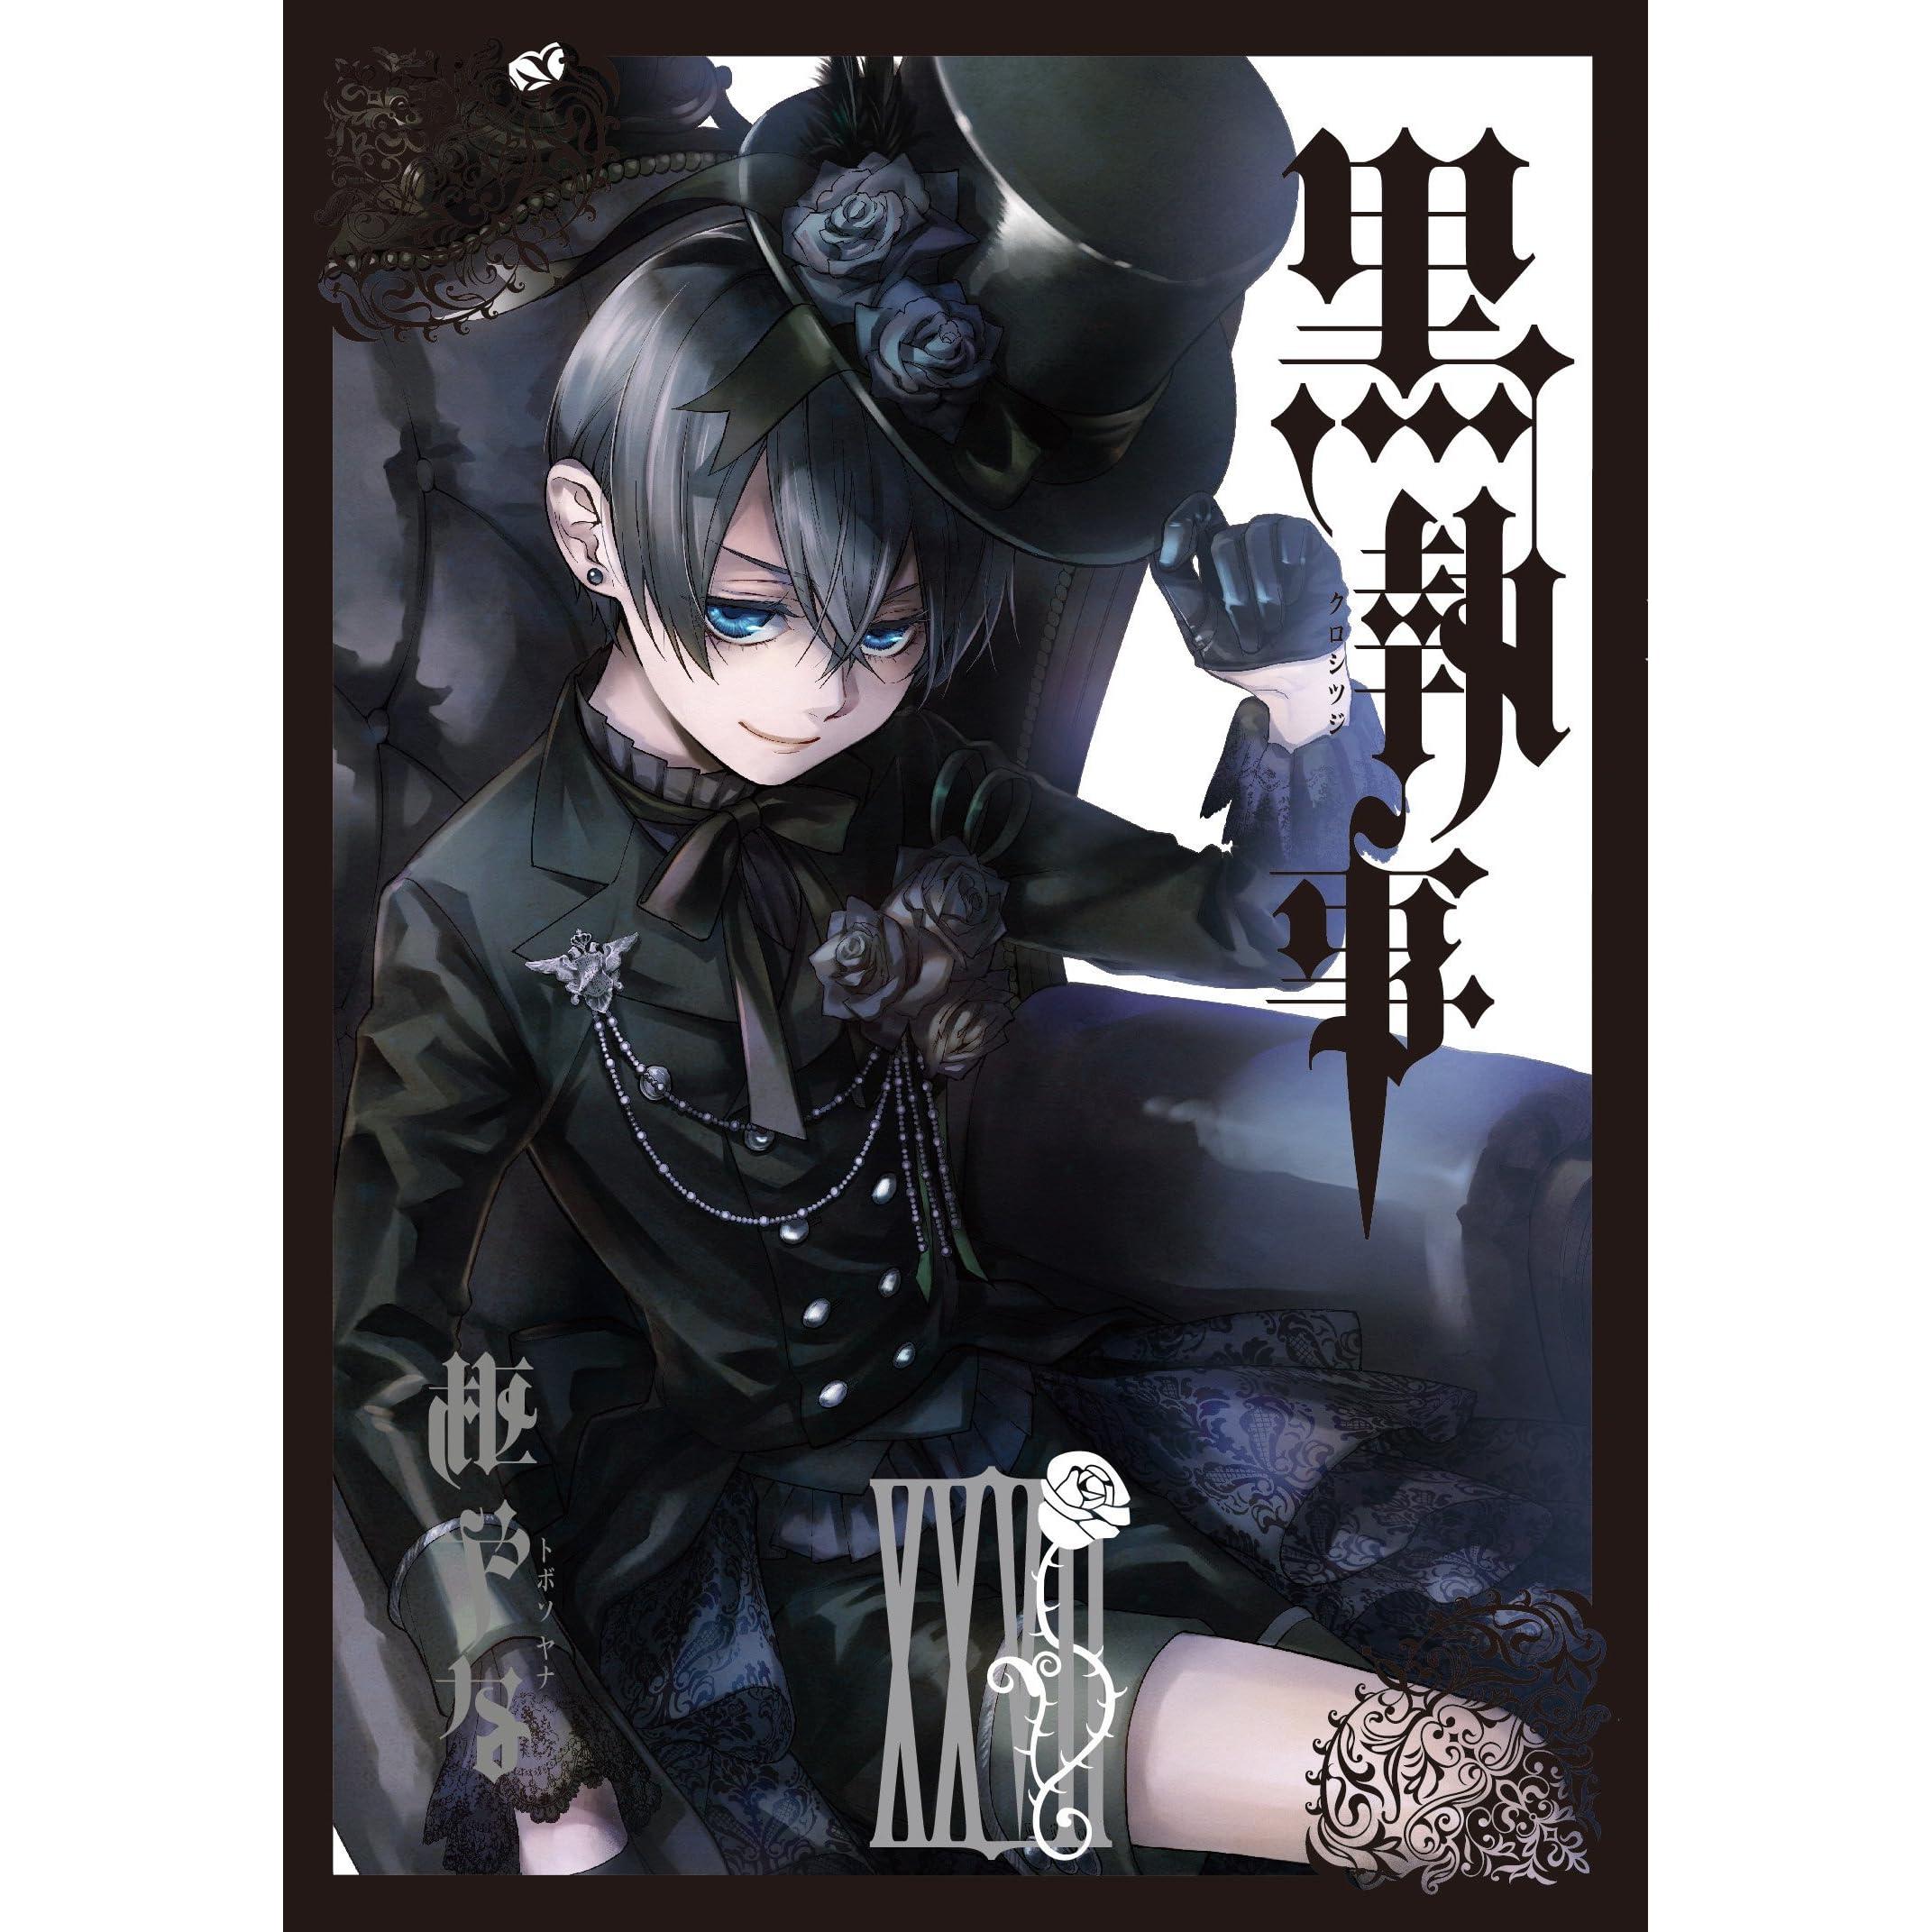 Art Book JAPAN Yana Toboso Artworks Black Butler Kuroshitsuji vol.1